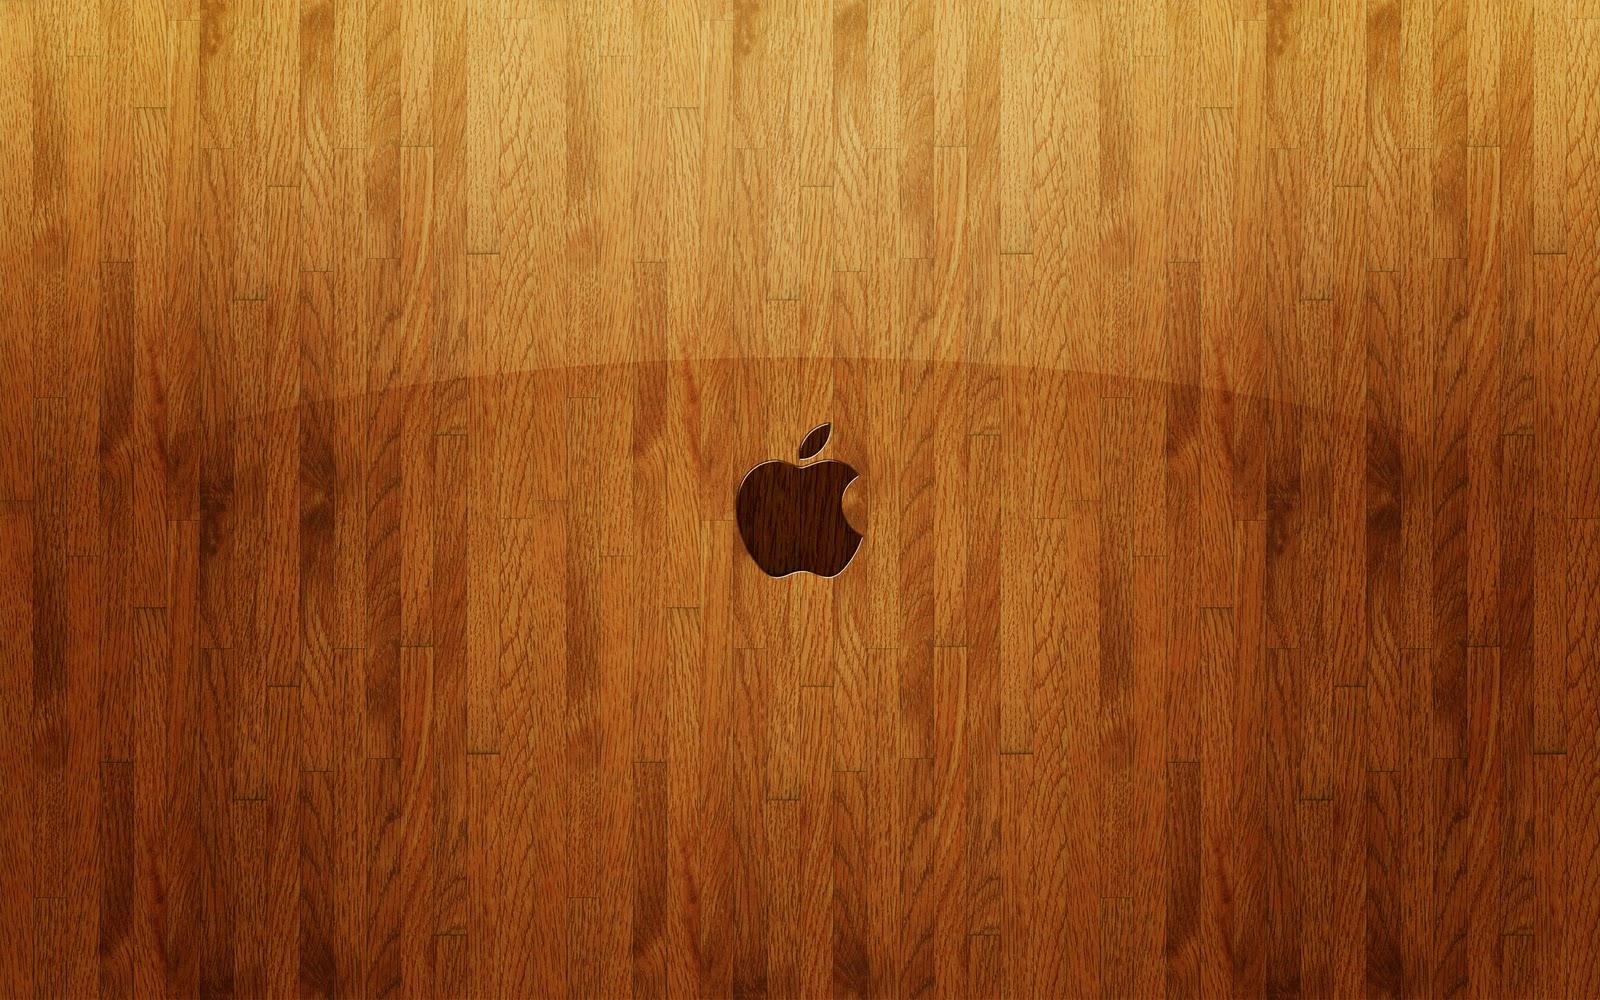 http://3.bp.blogspot.com/_3KUGN78pdf0/TL48Z4Gdl8I/AAAAAAAAACU/QYLYYFdJnDw/s1600/Wooden+Wall.jpg